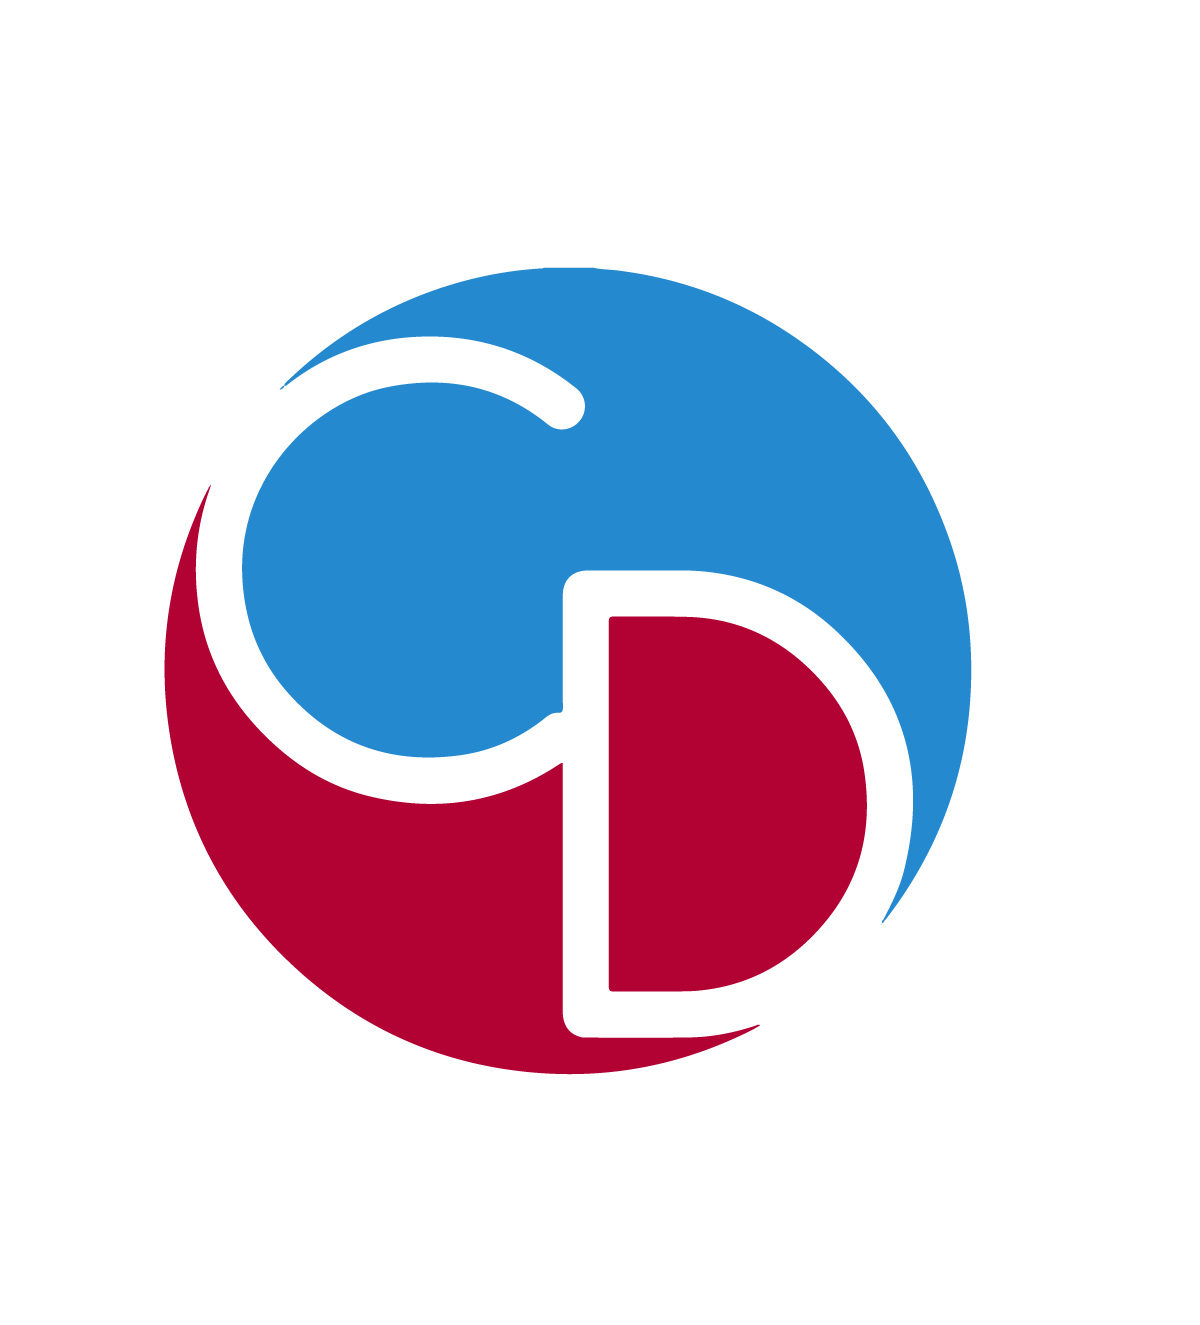 Cd_Round_Logo_Transparent.png